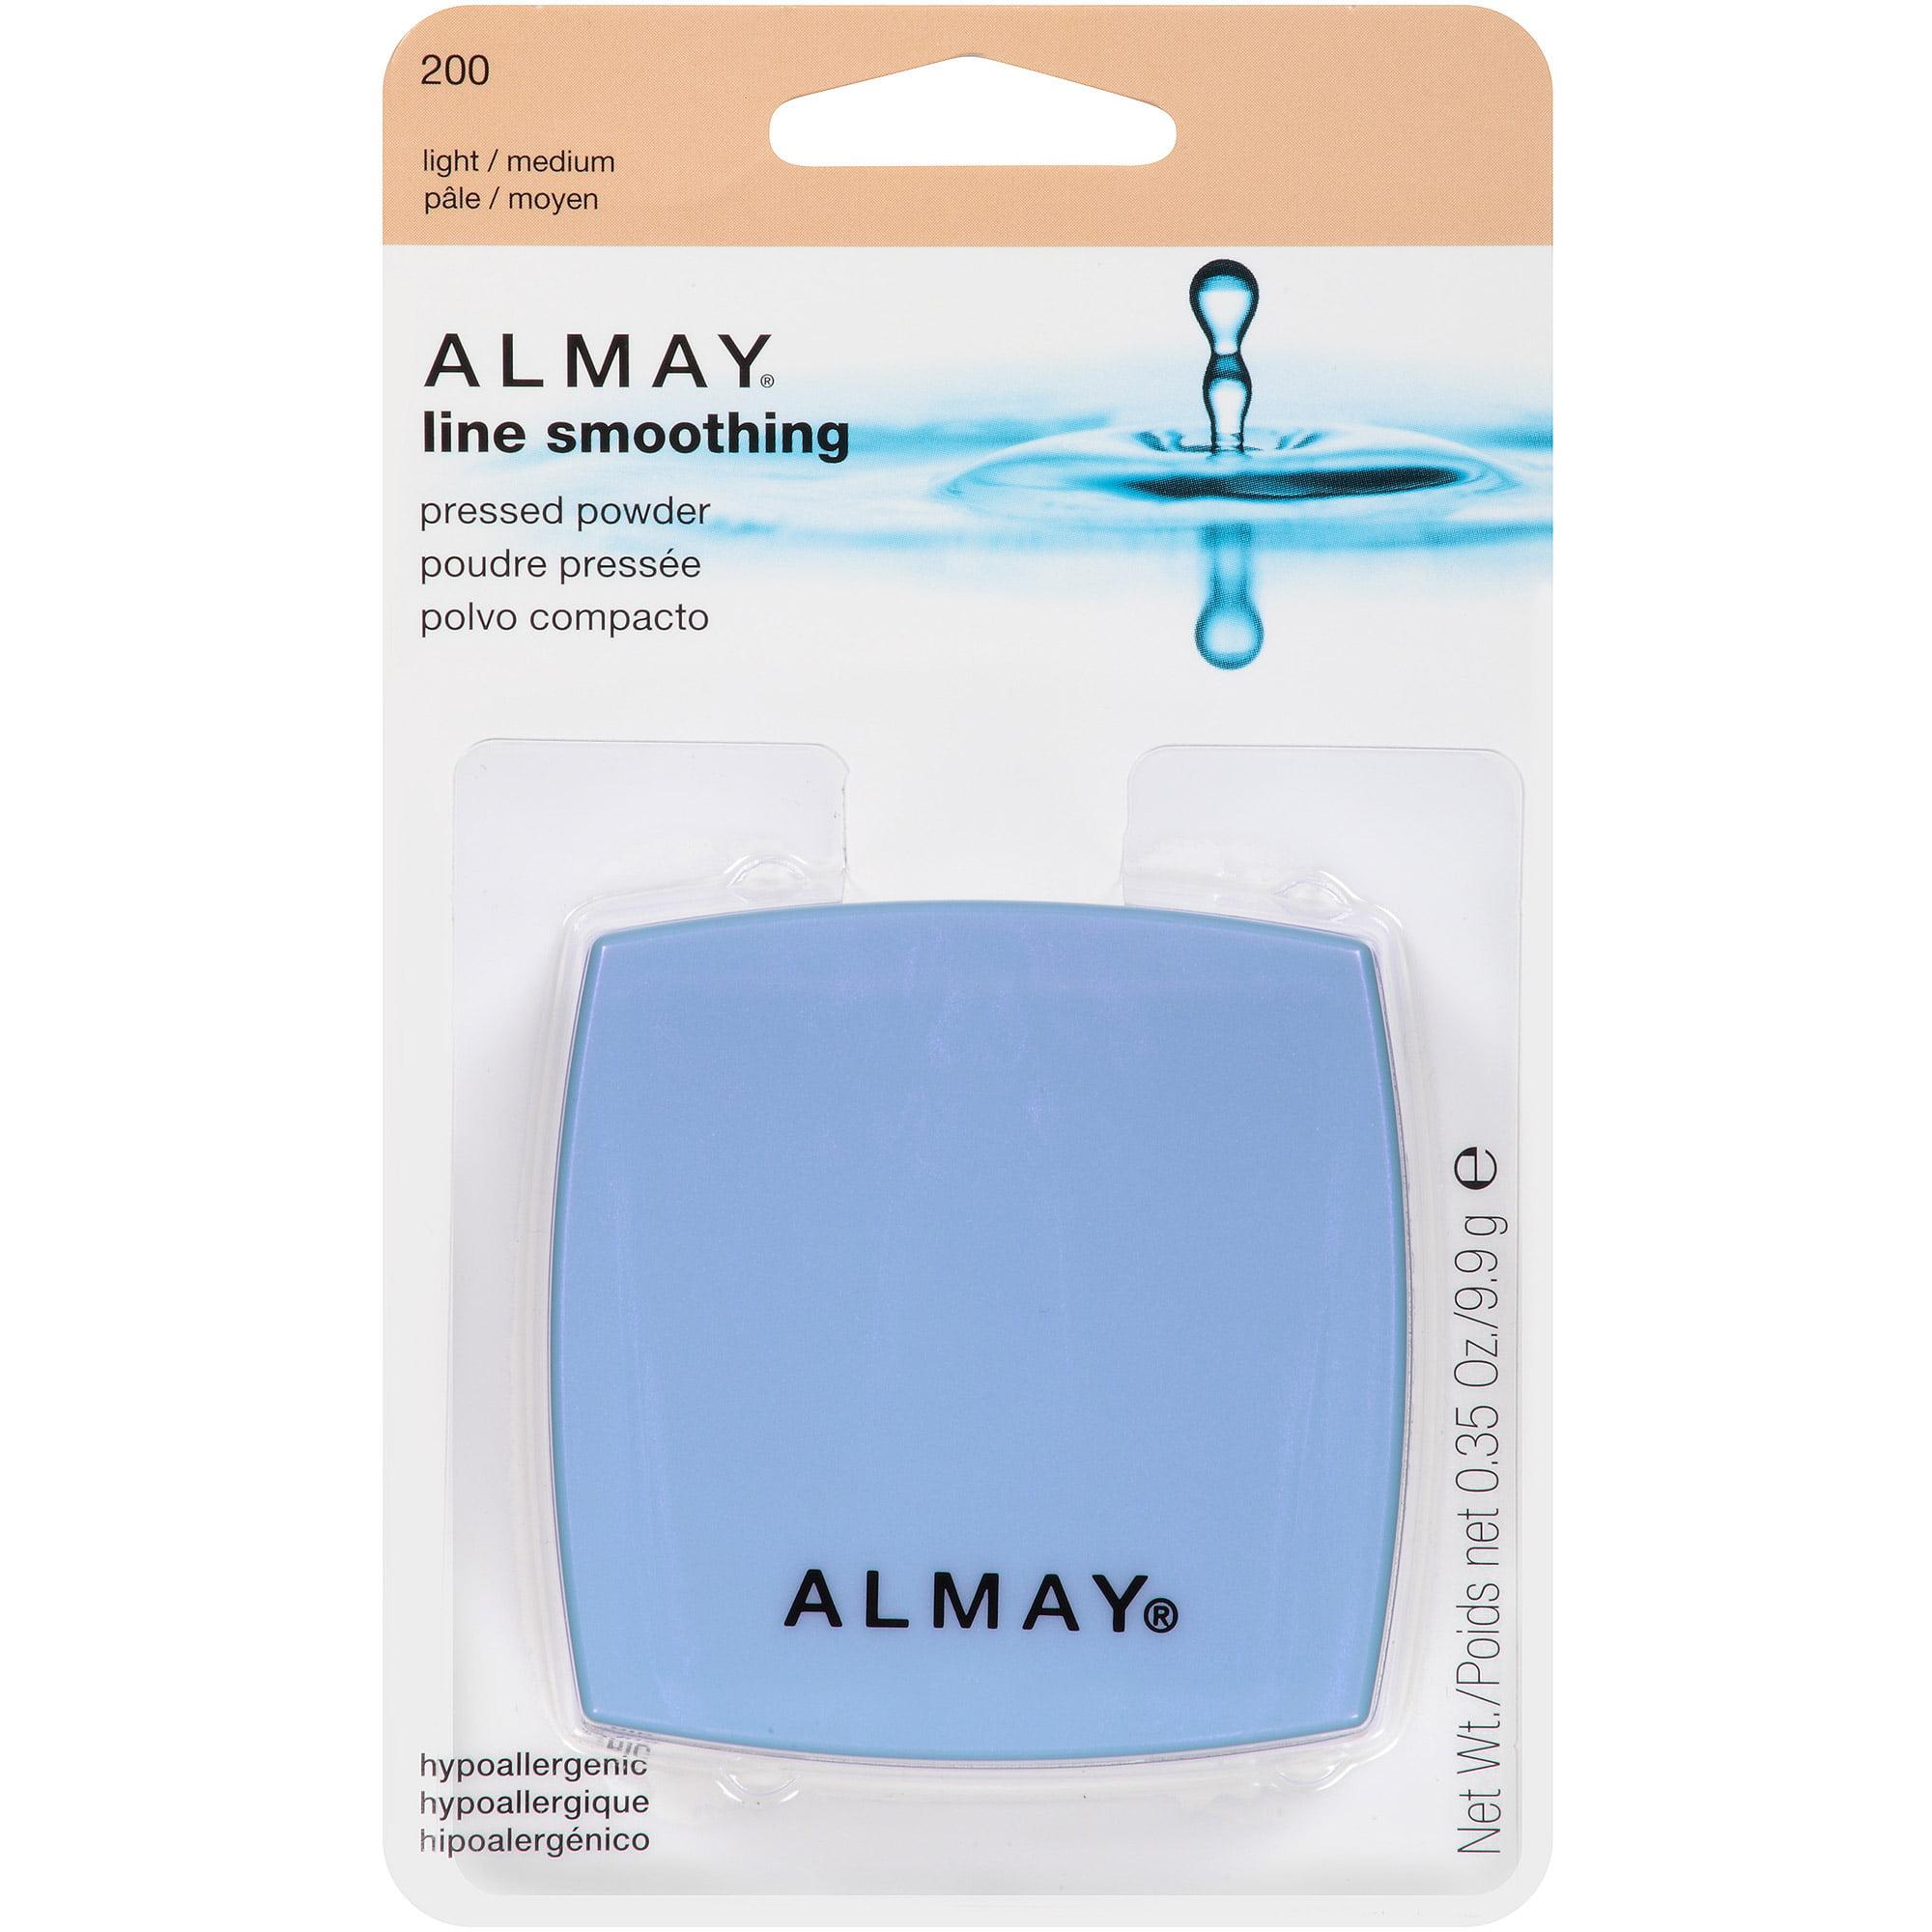 Almay Line Smoothing Pressed Powder 200 Light Medium 0